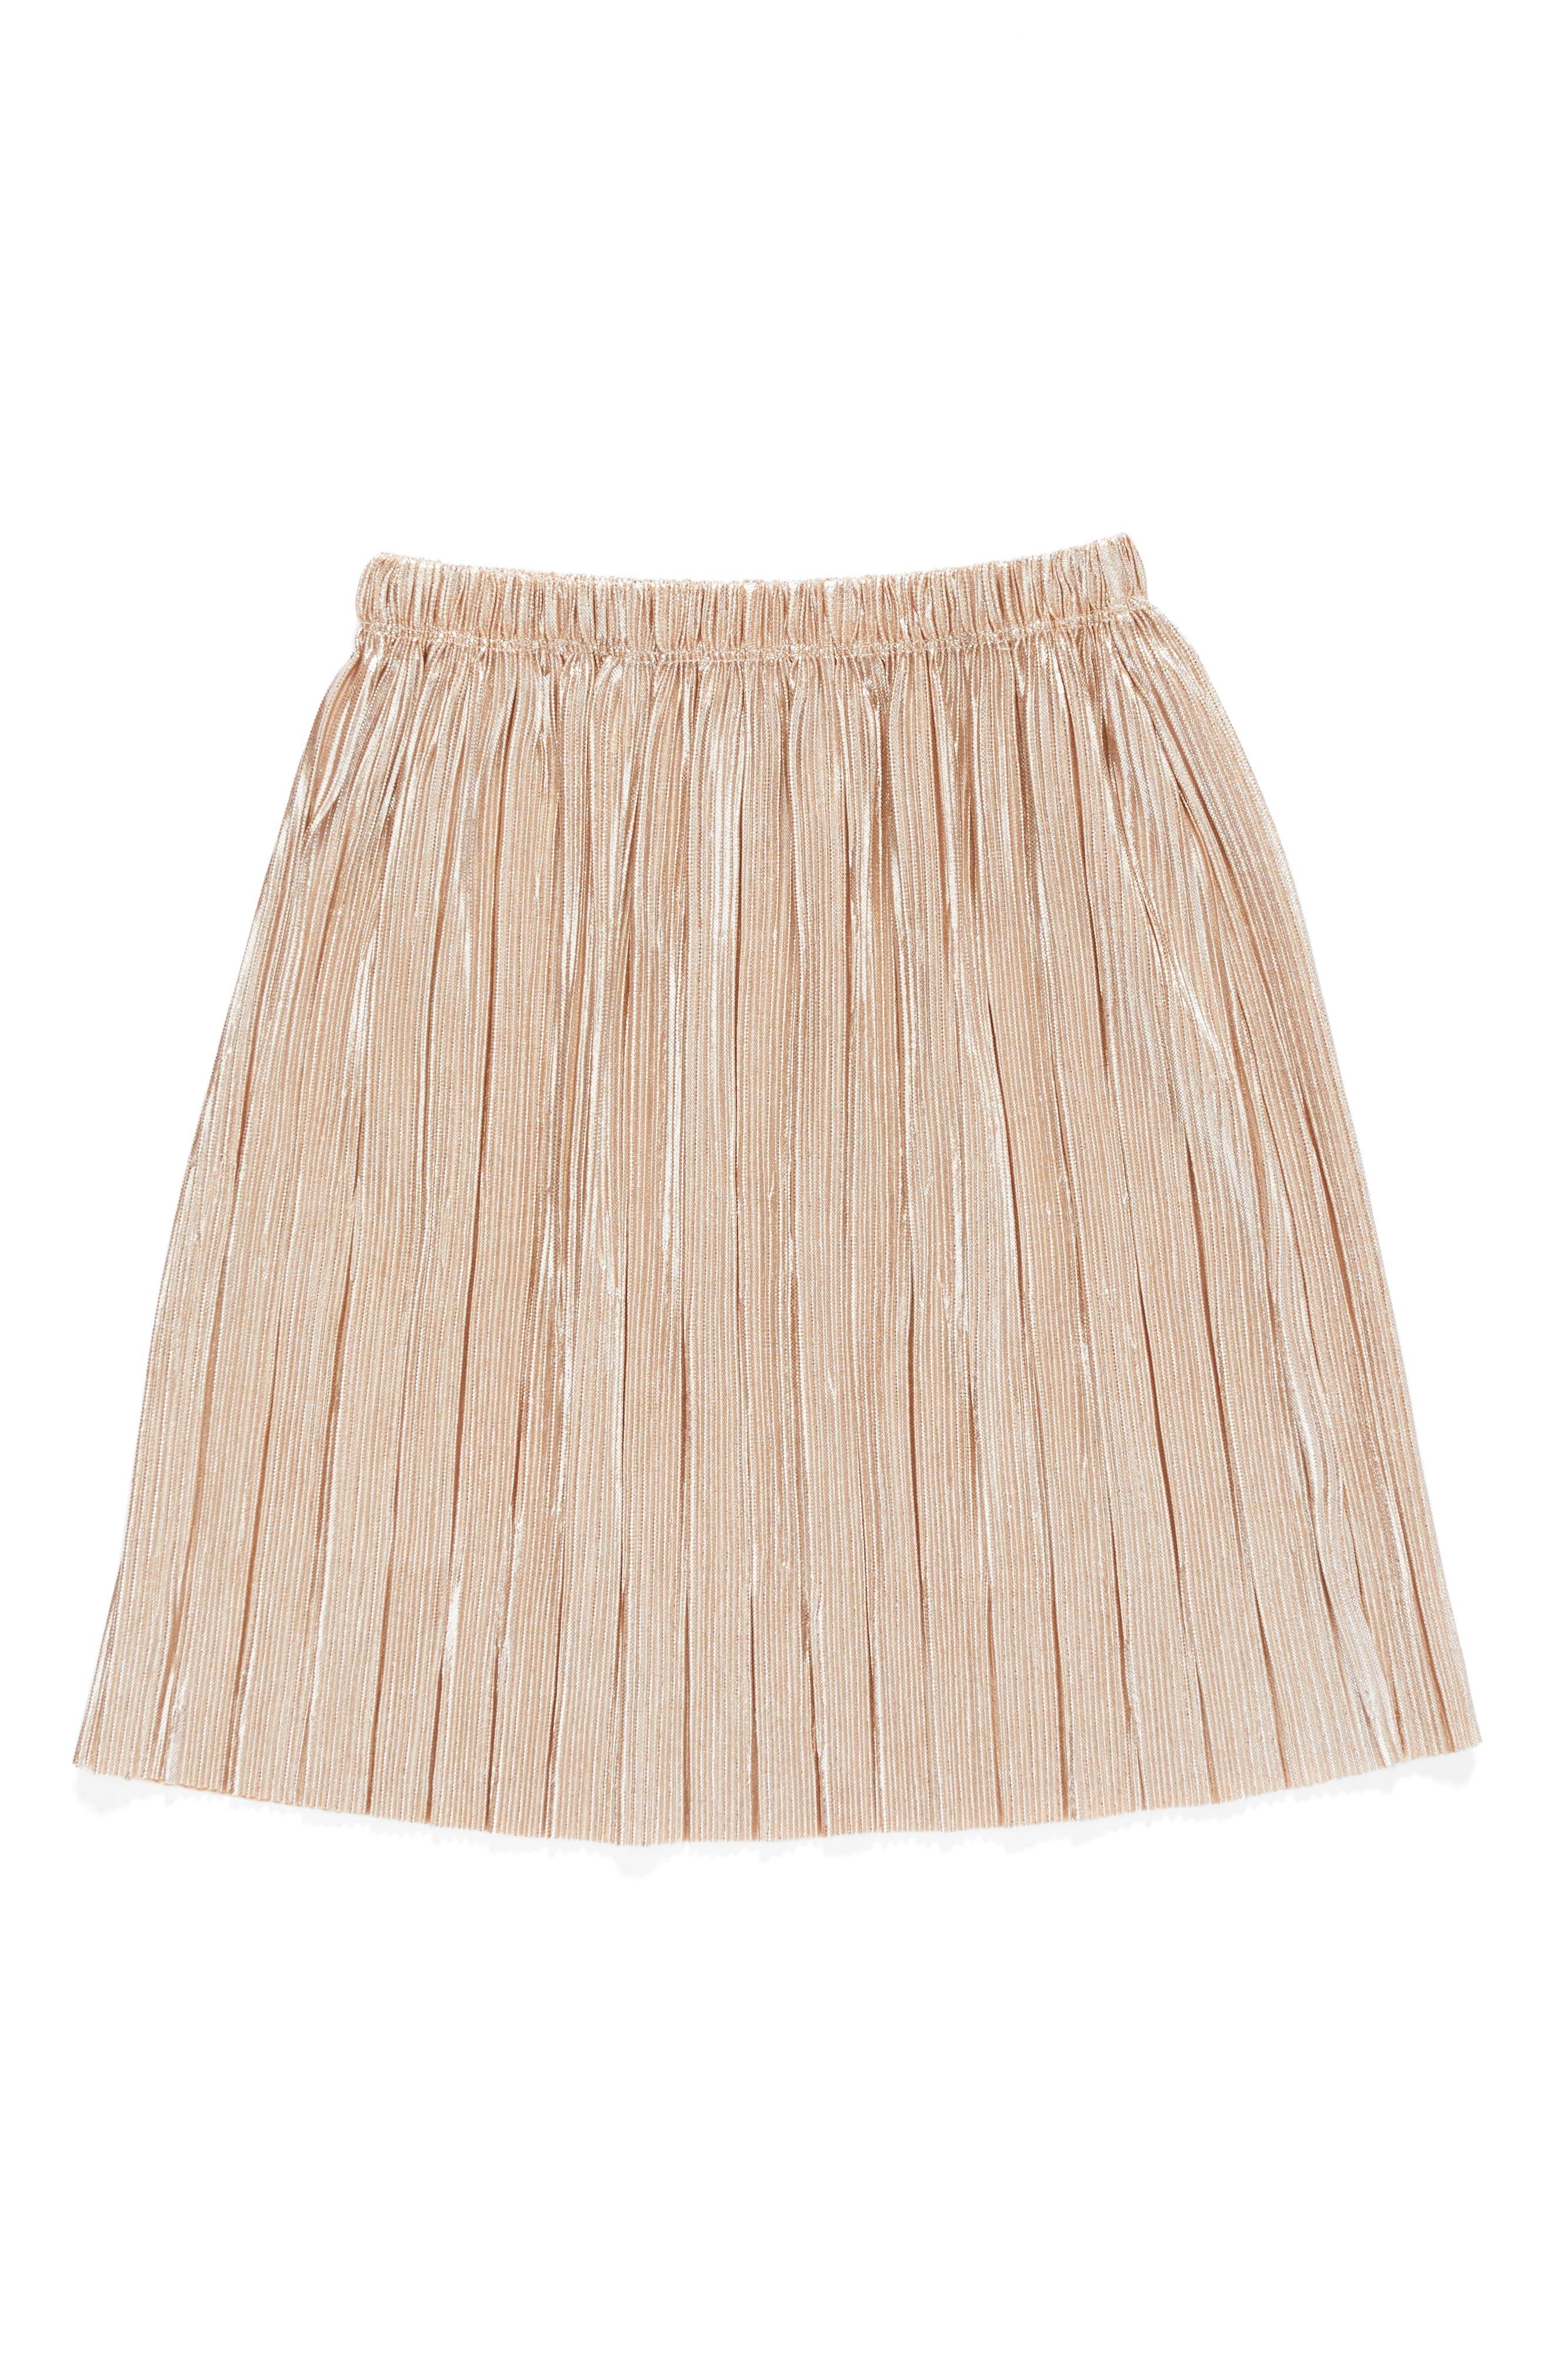 Main Image - Truly Me Metallic Pleated Skirt (Toddler Girls & Little Girls)